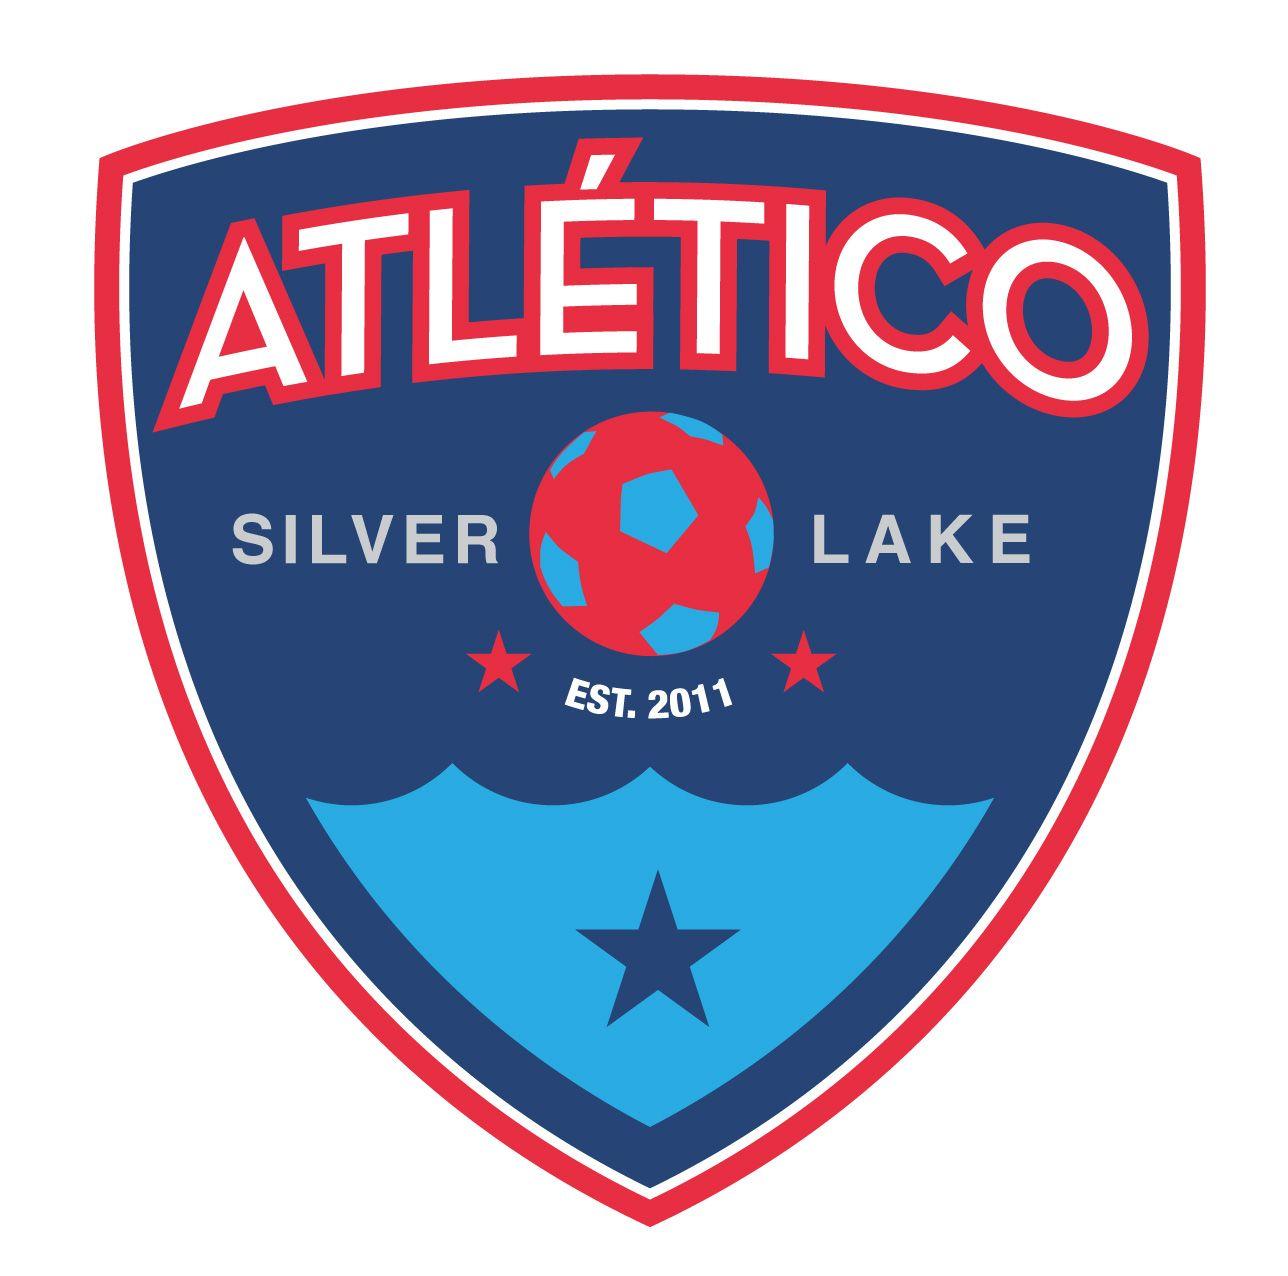 vector logo for my local soccer club, Atlético Silverlake